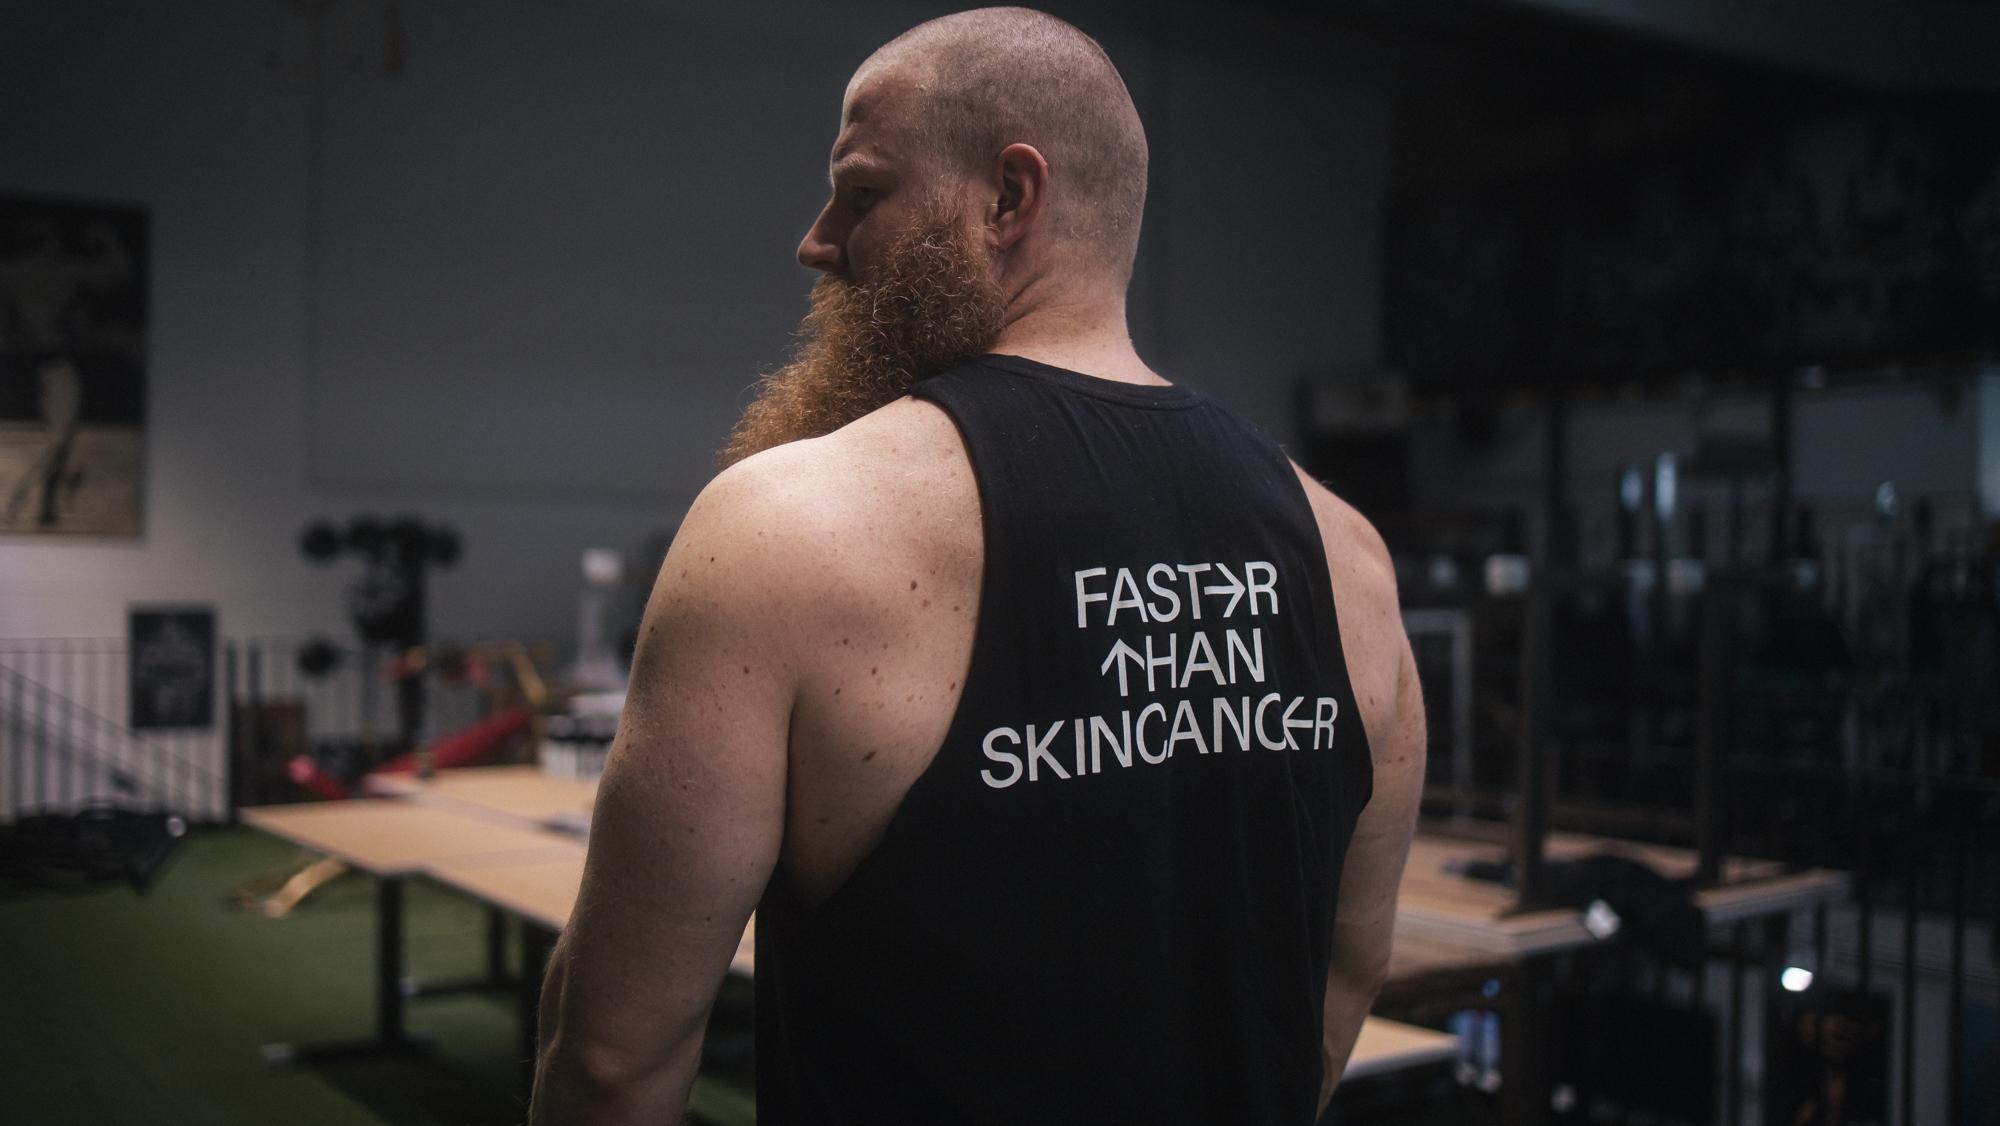 Faster Than Skincancer mit kraftdreikämpfer Alexander Pürzel 7